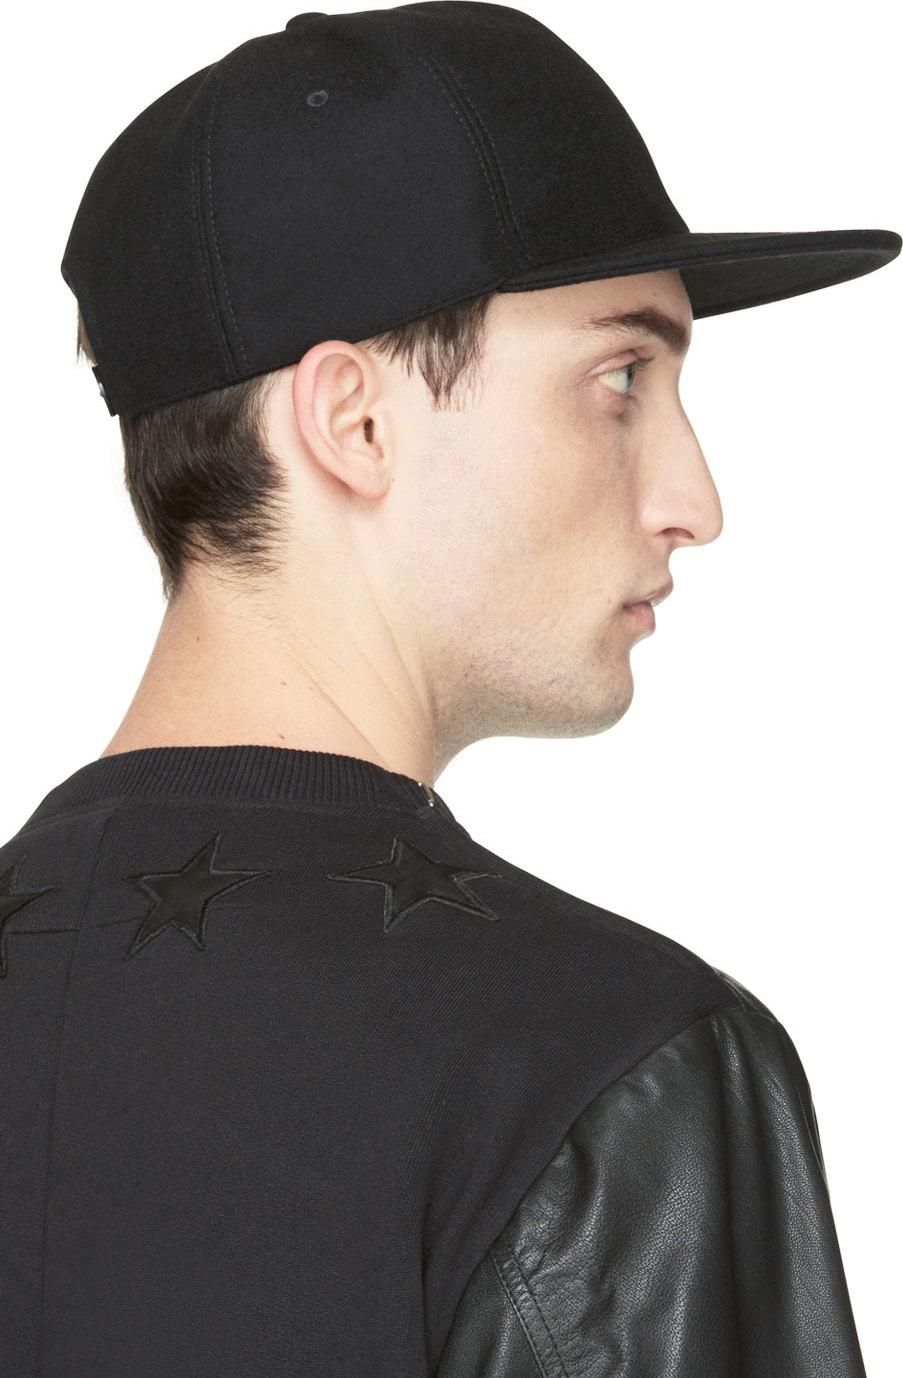 Lyst - Givenchy Black Wool Cap in Black for Men 0246b269f3c